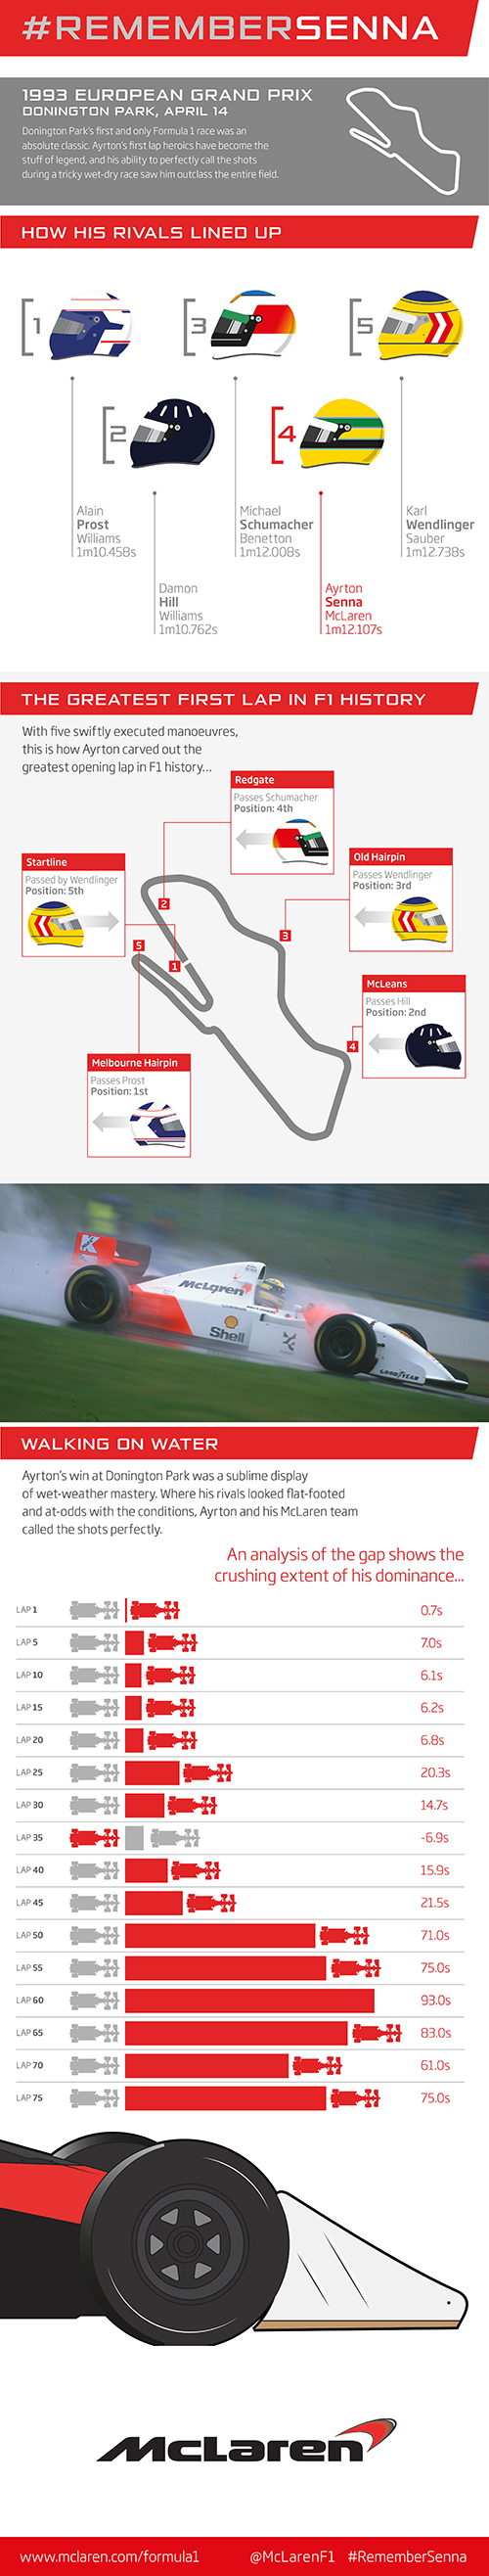 1993 European Grand Prix [infographic] #RememberSenna